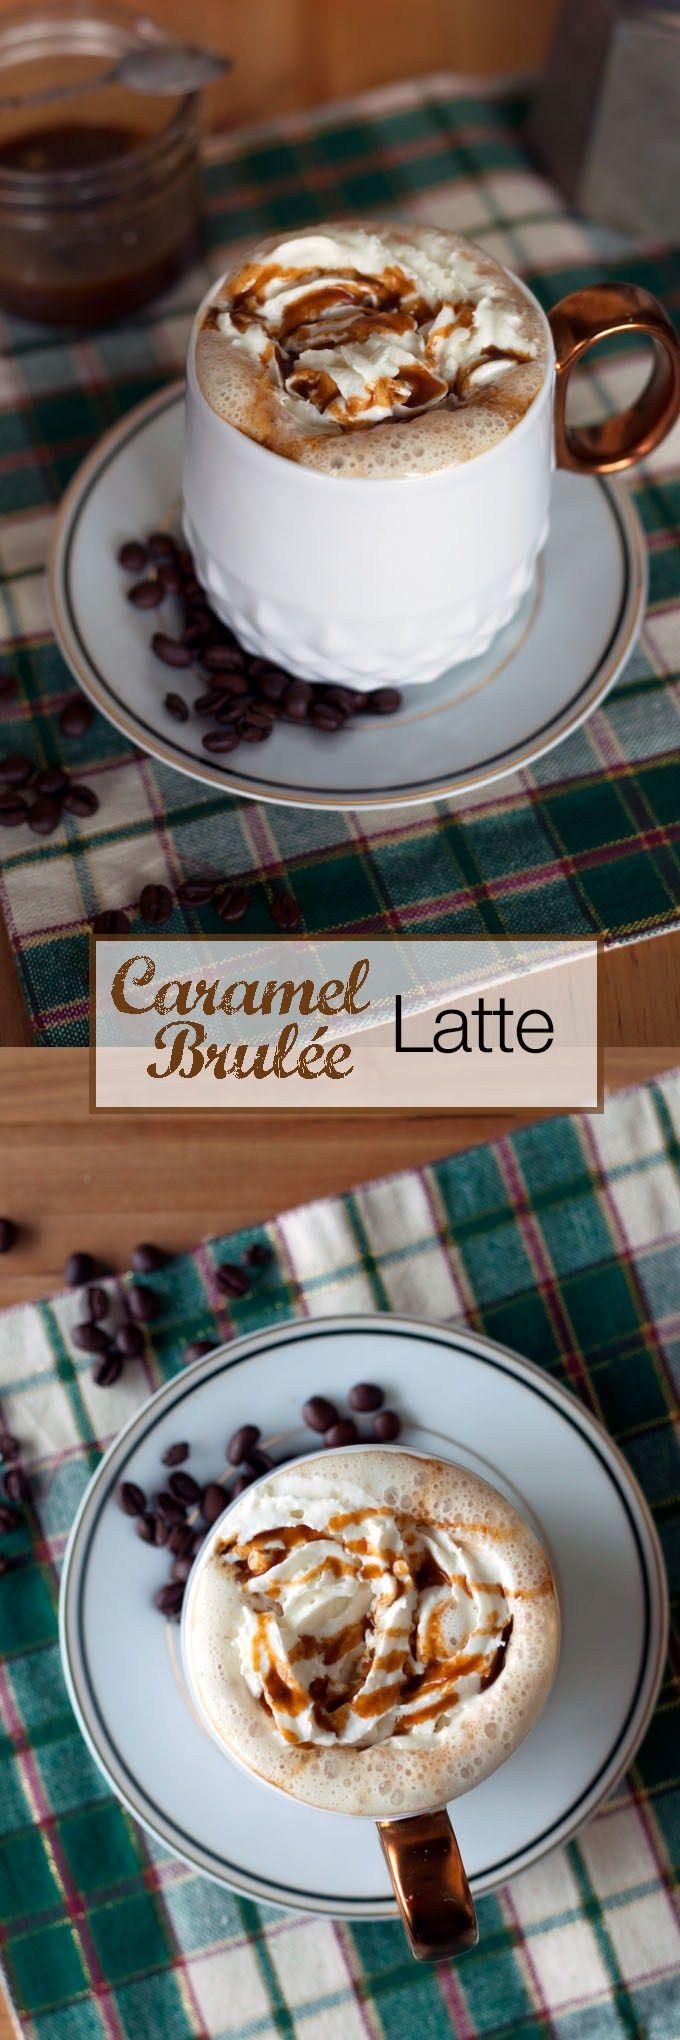 starbucks caramel brulee latte recipe